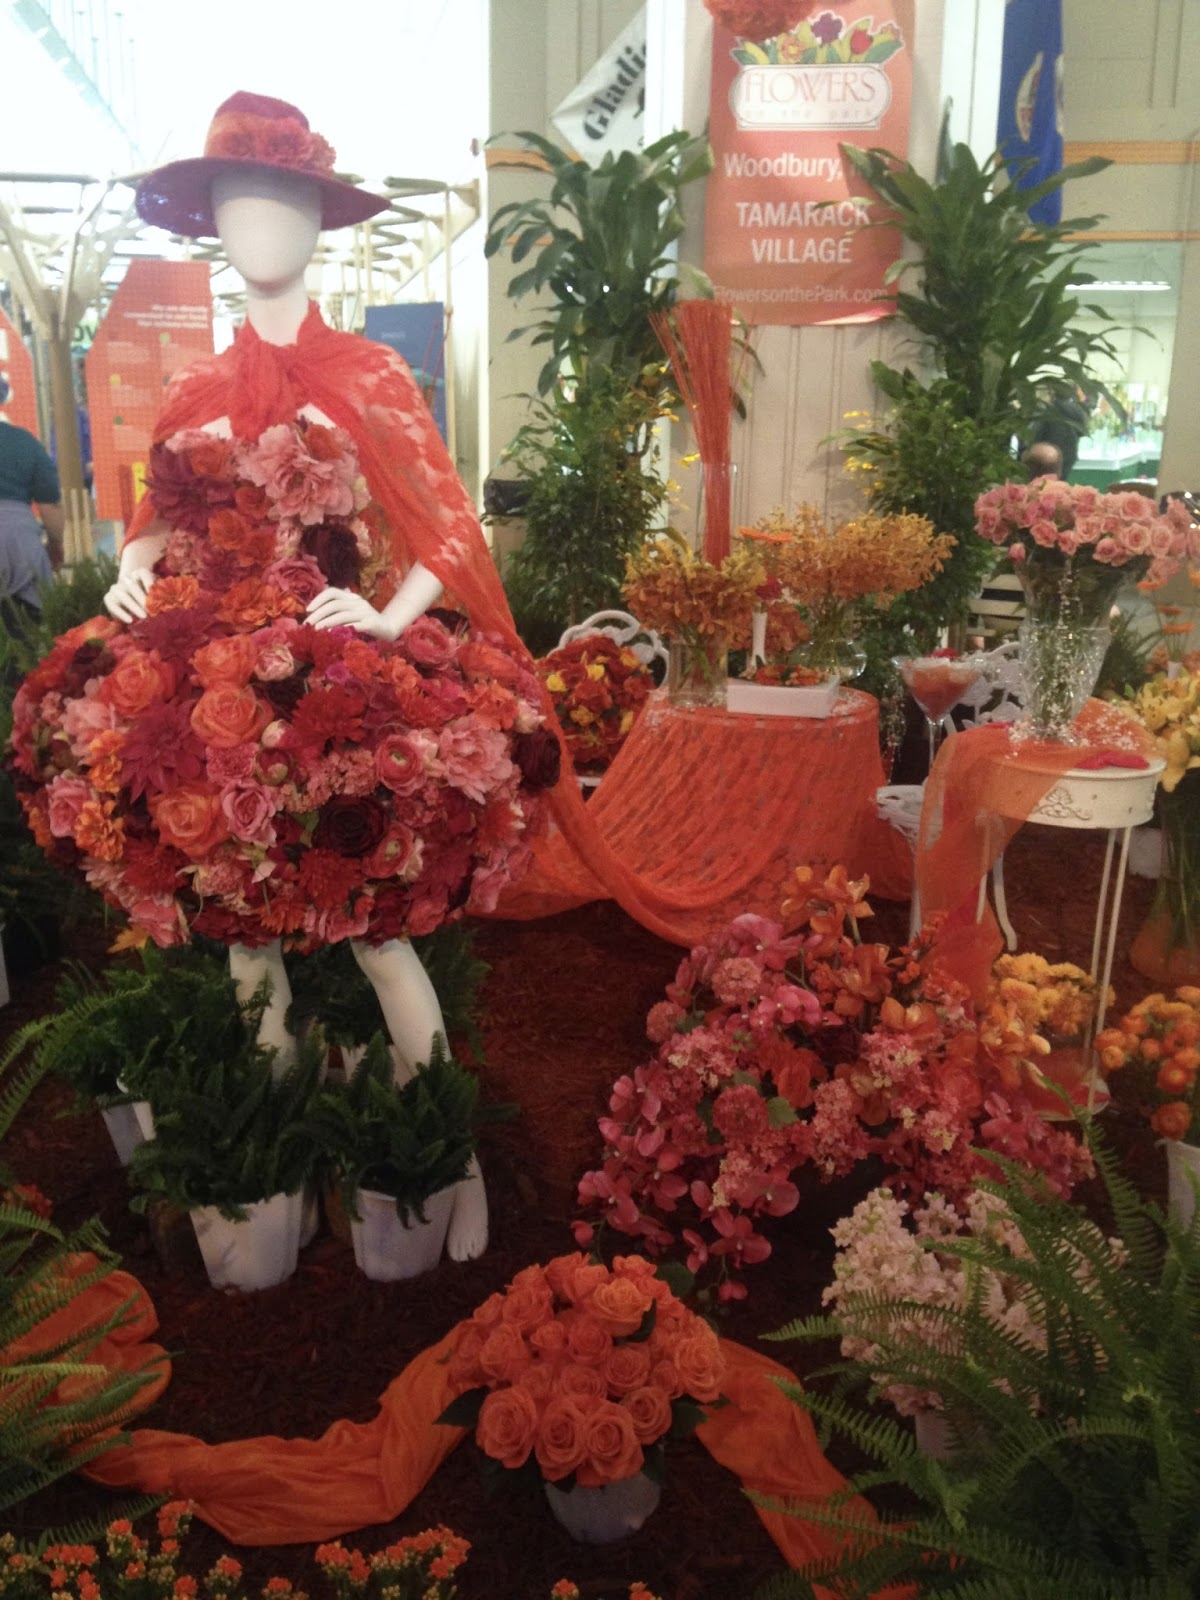 Amys Creative Pursuits The Minnesota State Fair Flower Exhibit